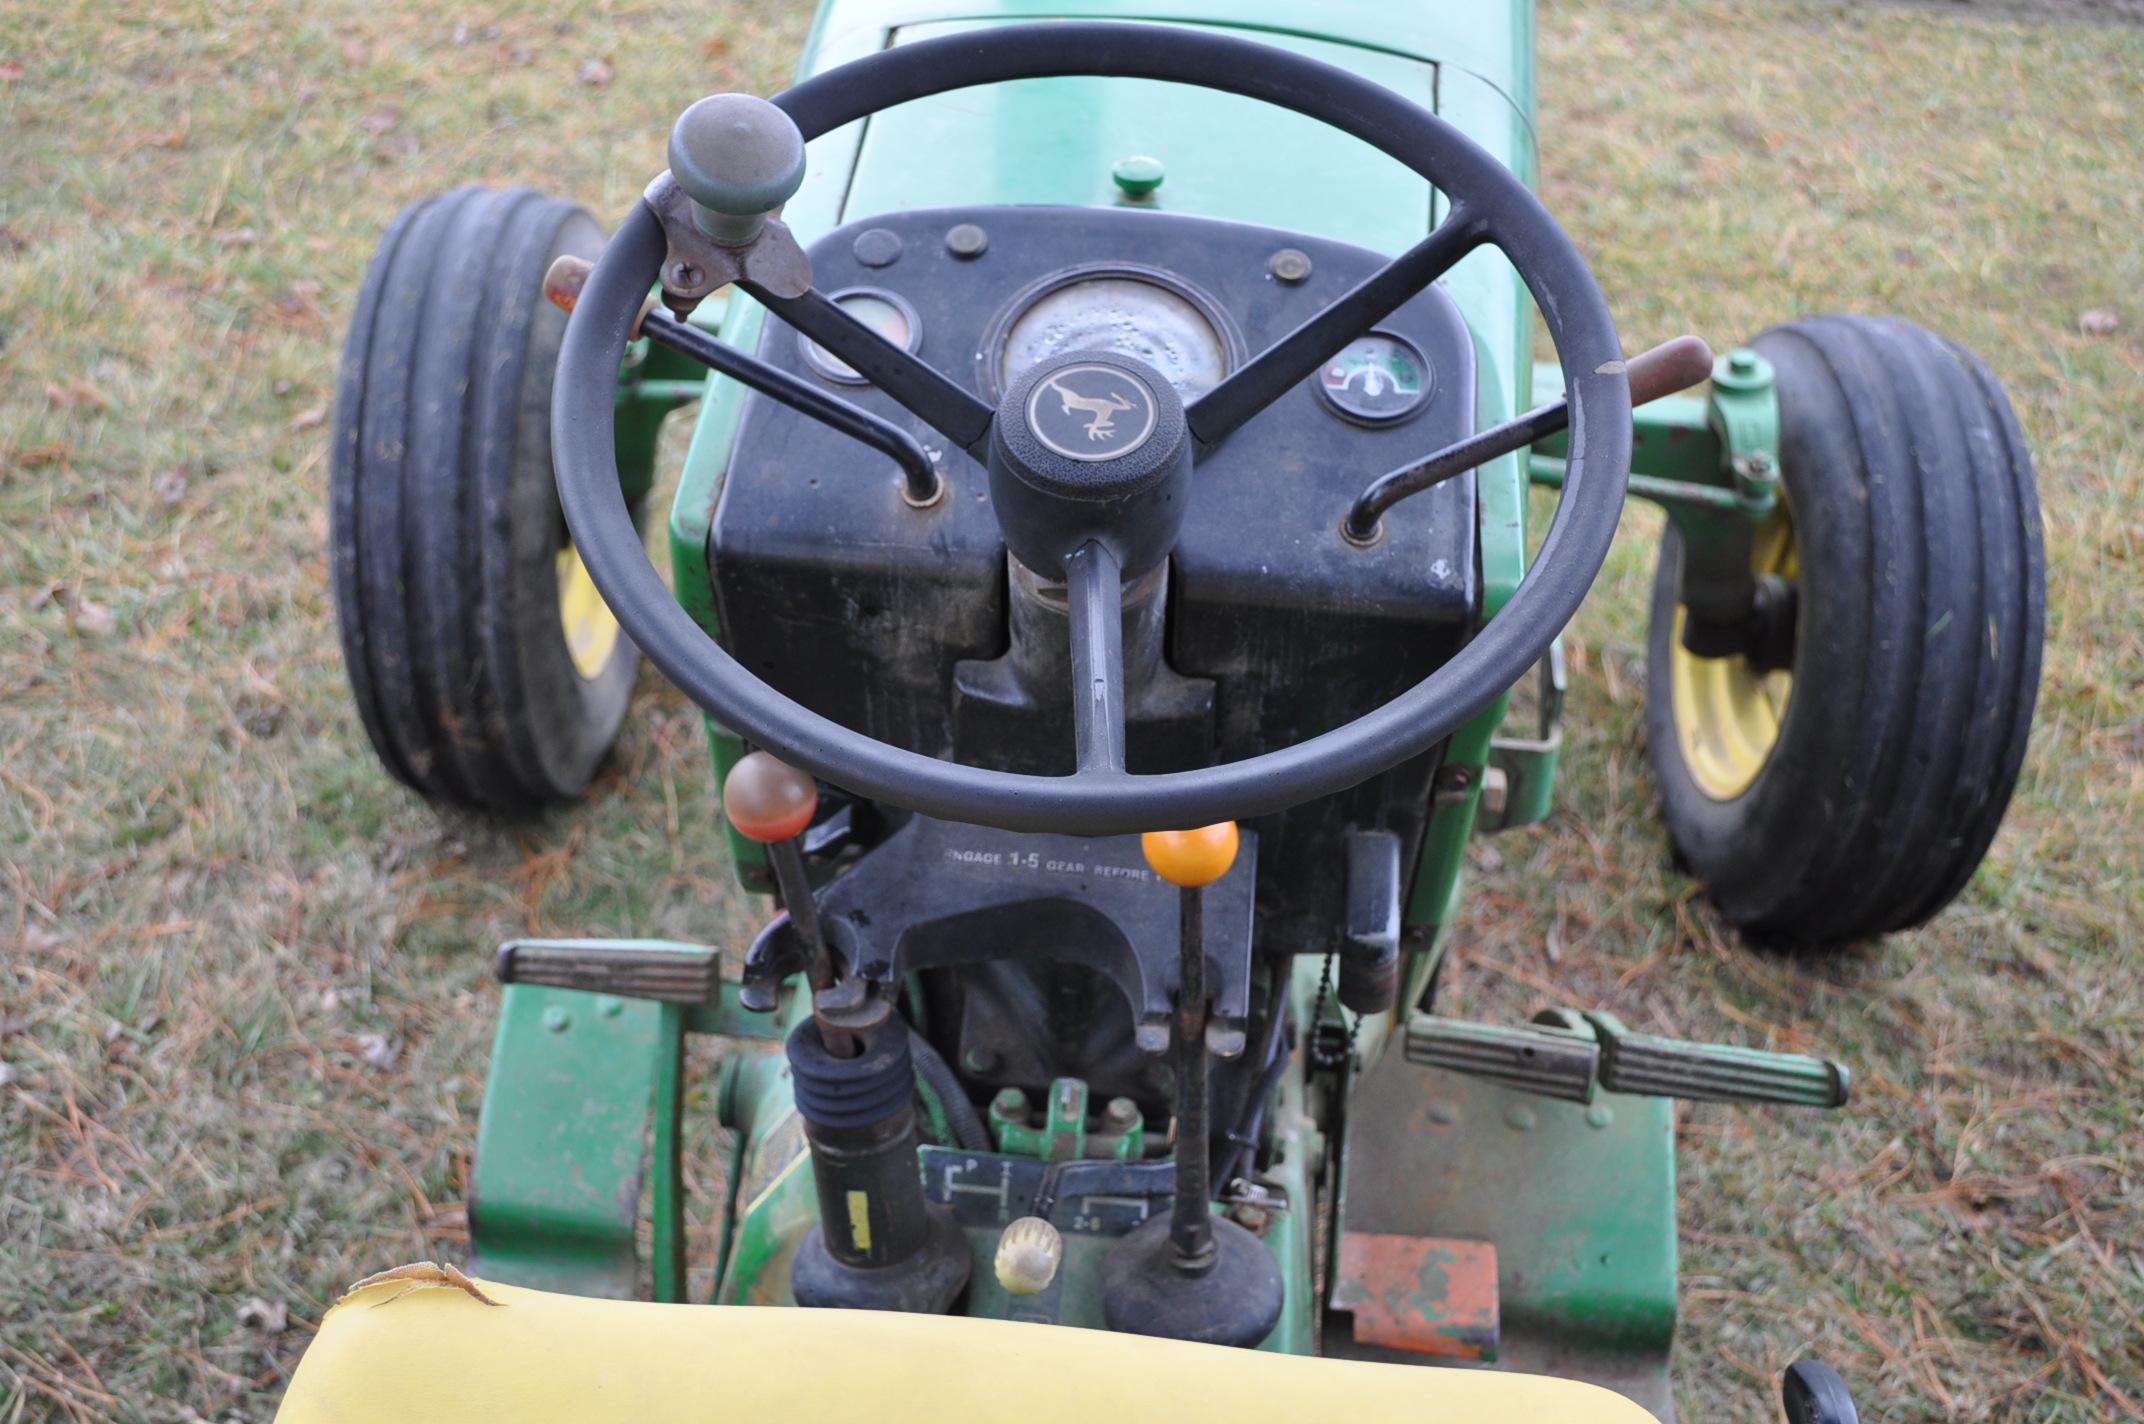 John Deere 2630 tractor, diesel, 16.9-28 rear, 9.5-15 front, 1 hyd remote, 540 pto, 3 pt, 4260 - Image 16 of 18